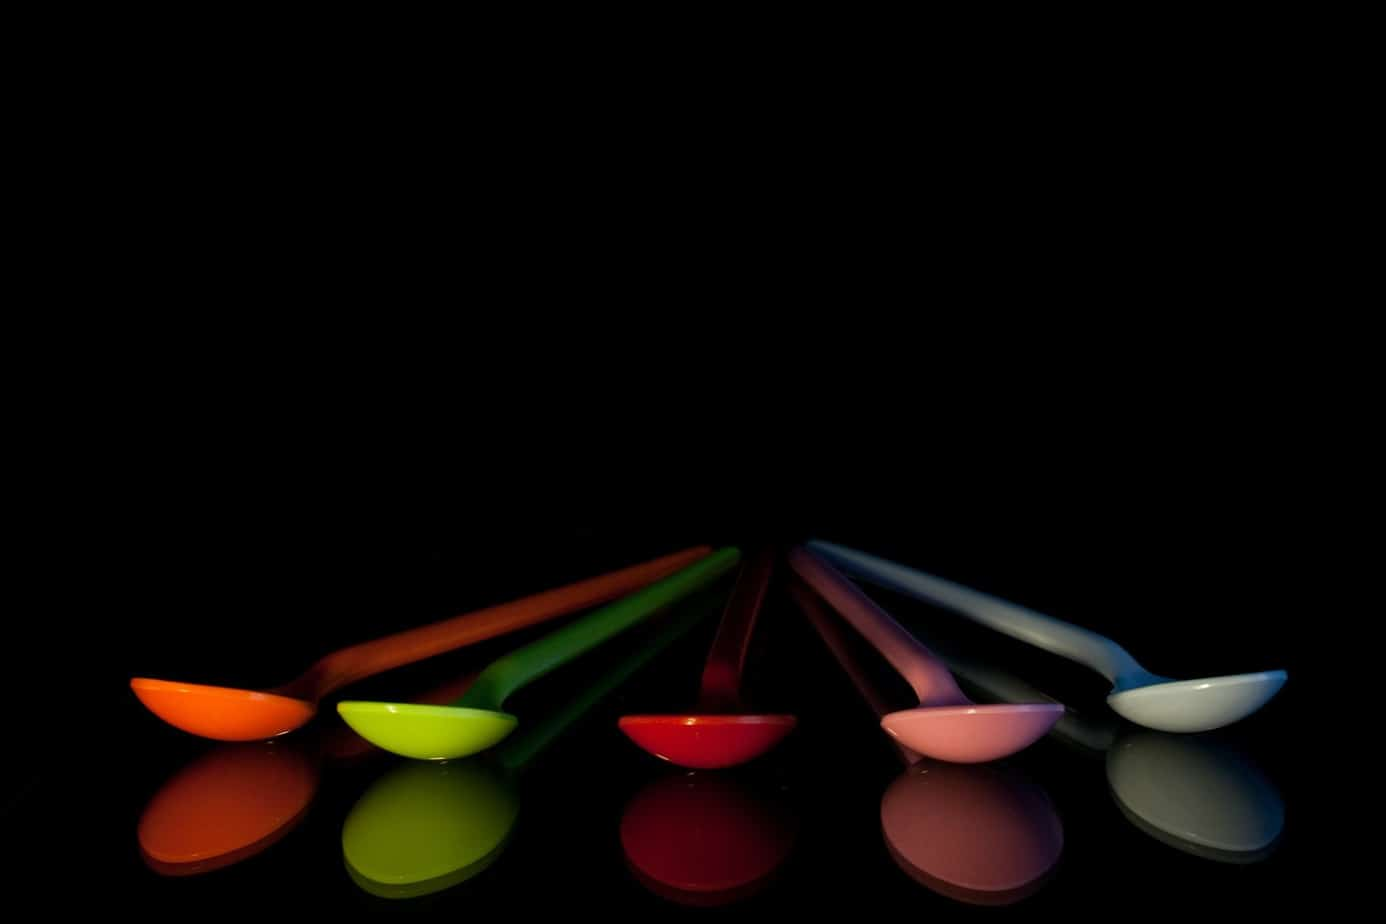 Spoon Theory - Energy Measurement